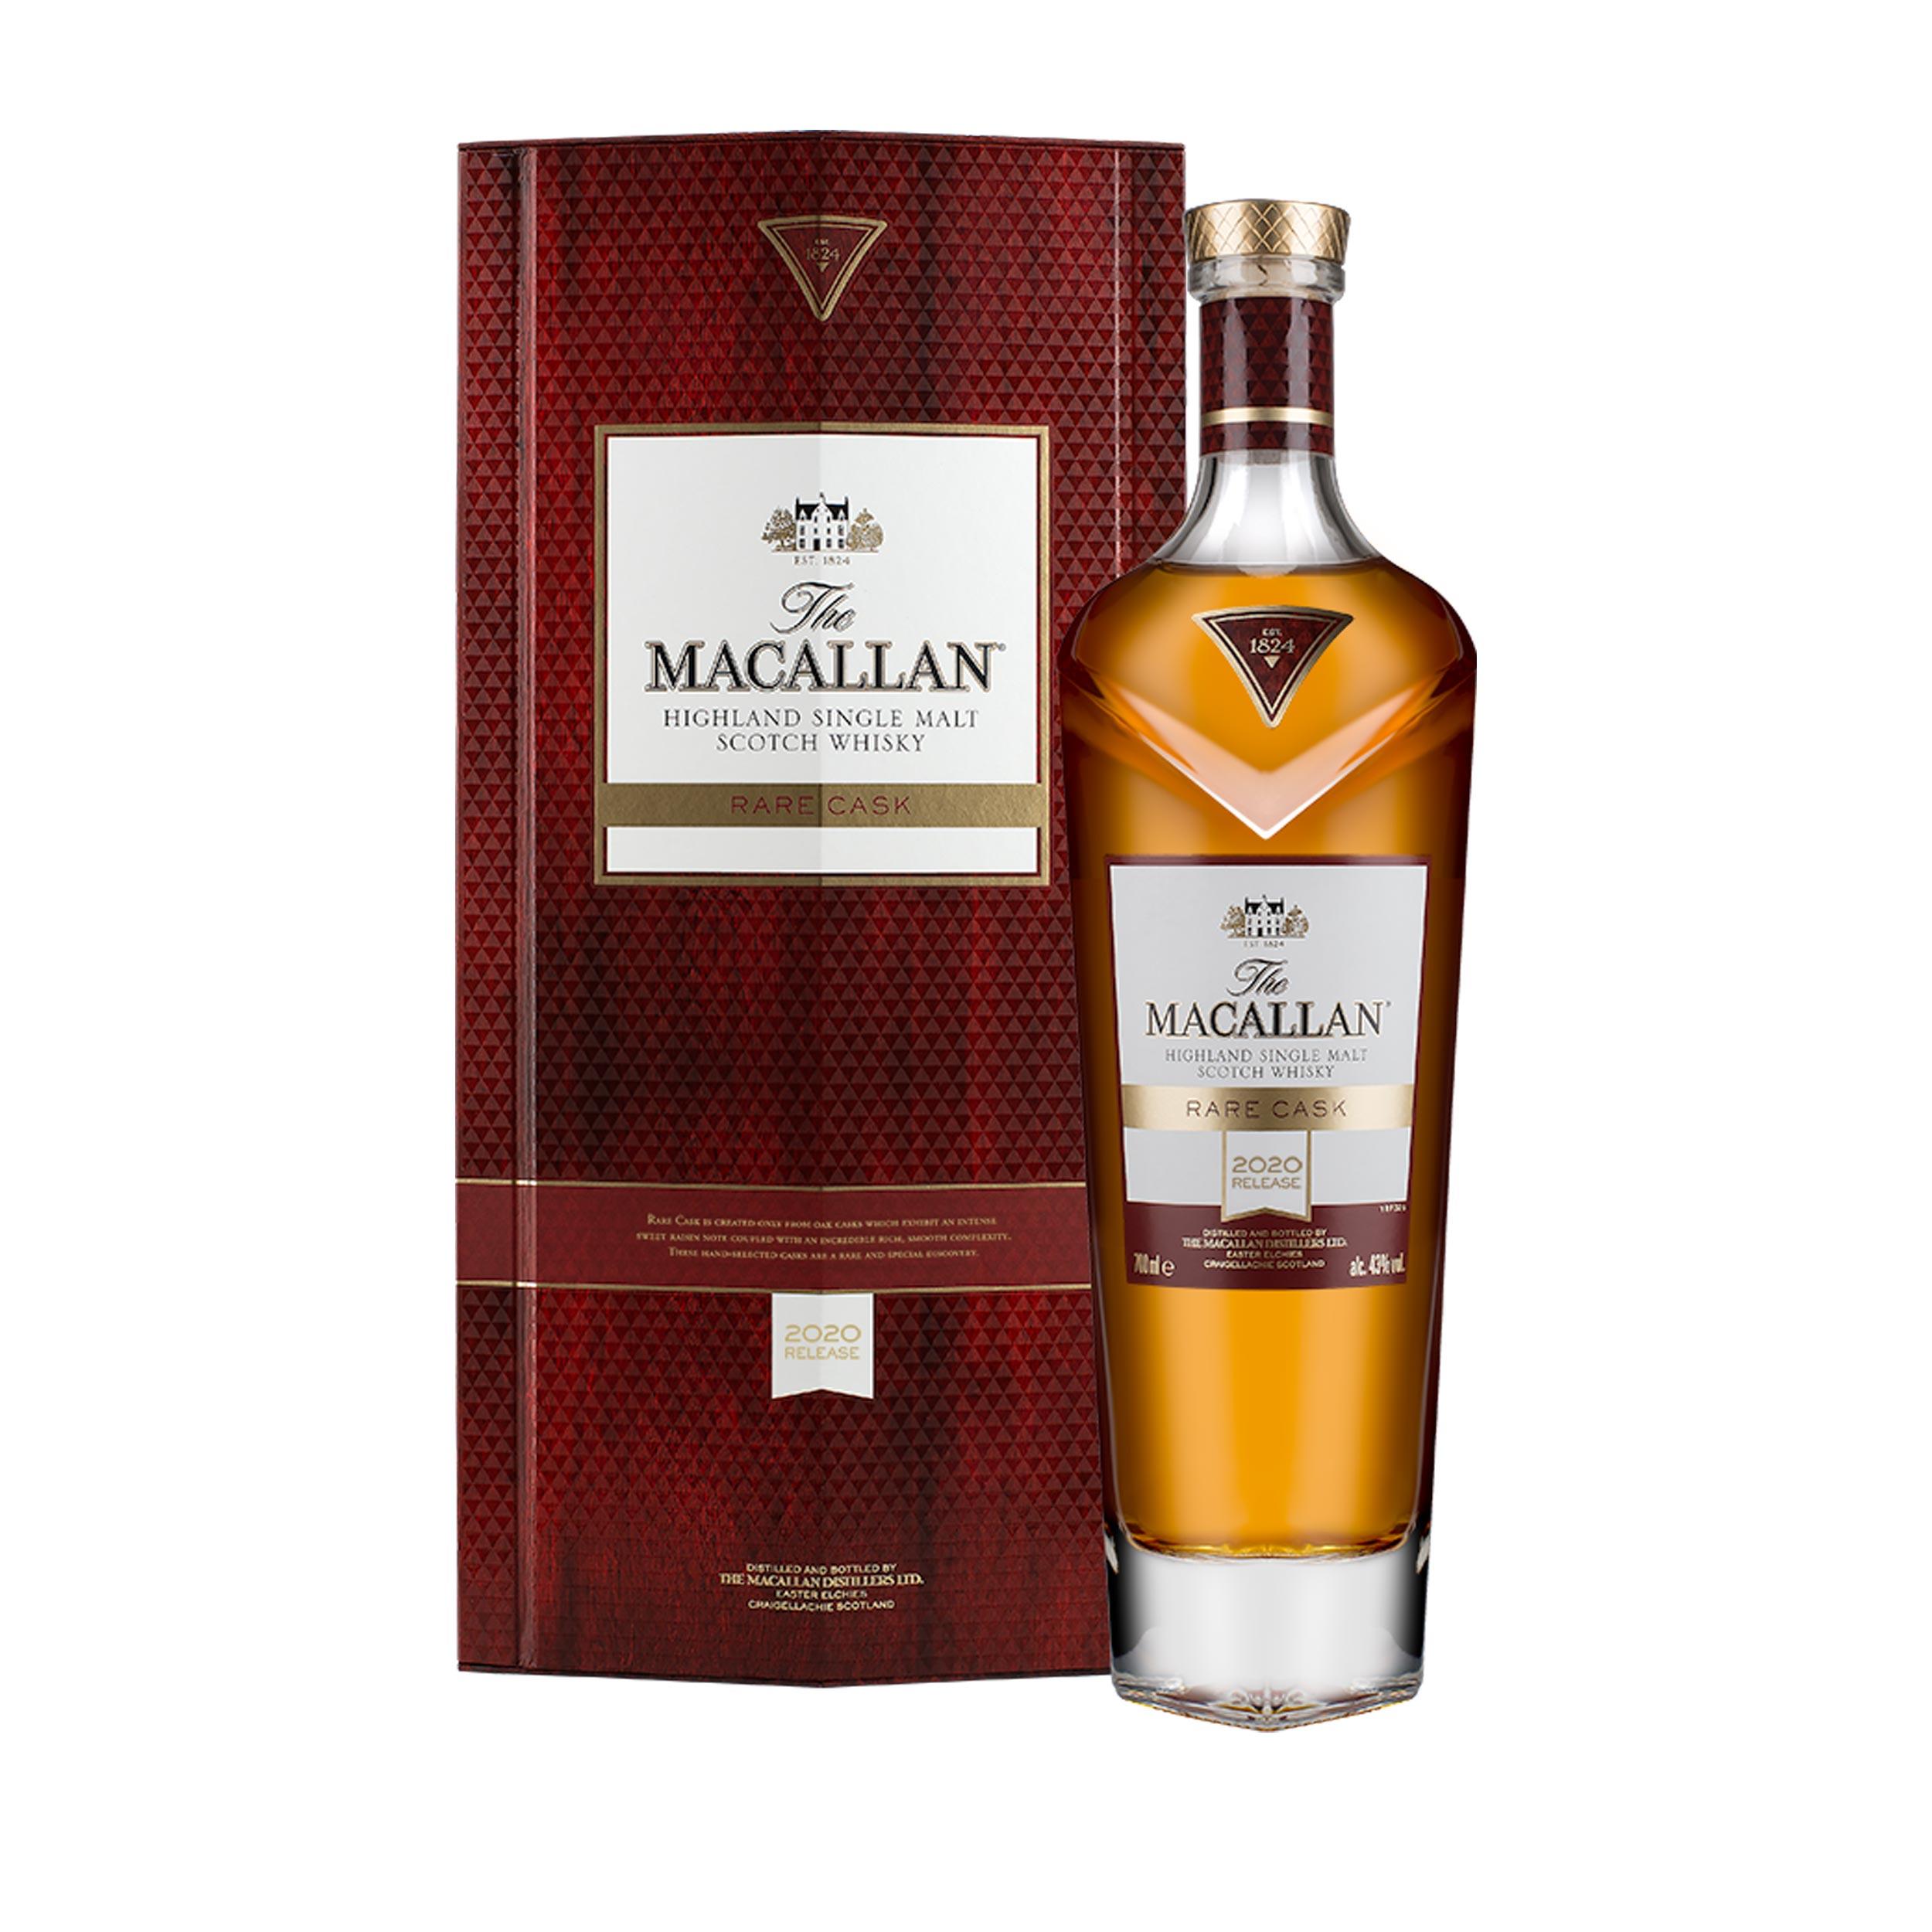 Macallan Rare Cask 2020 Release